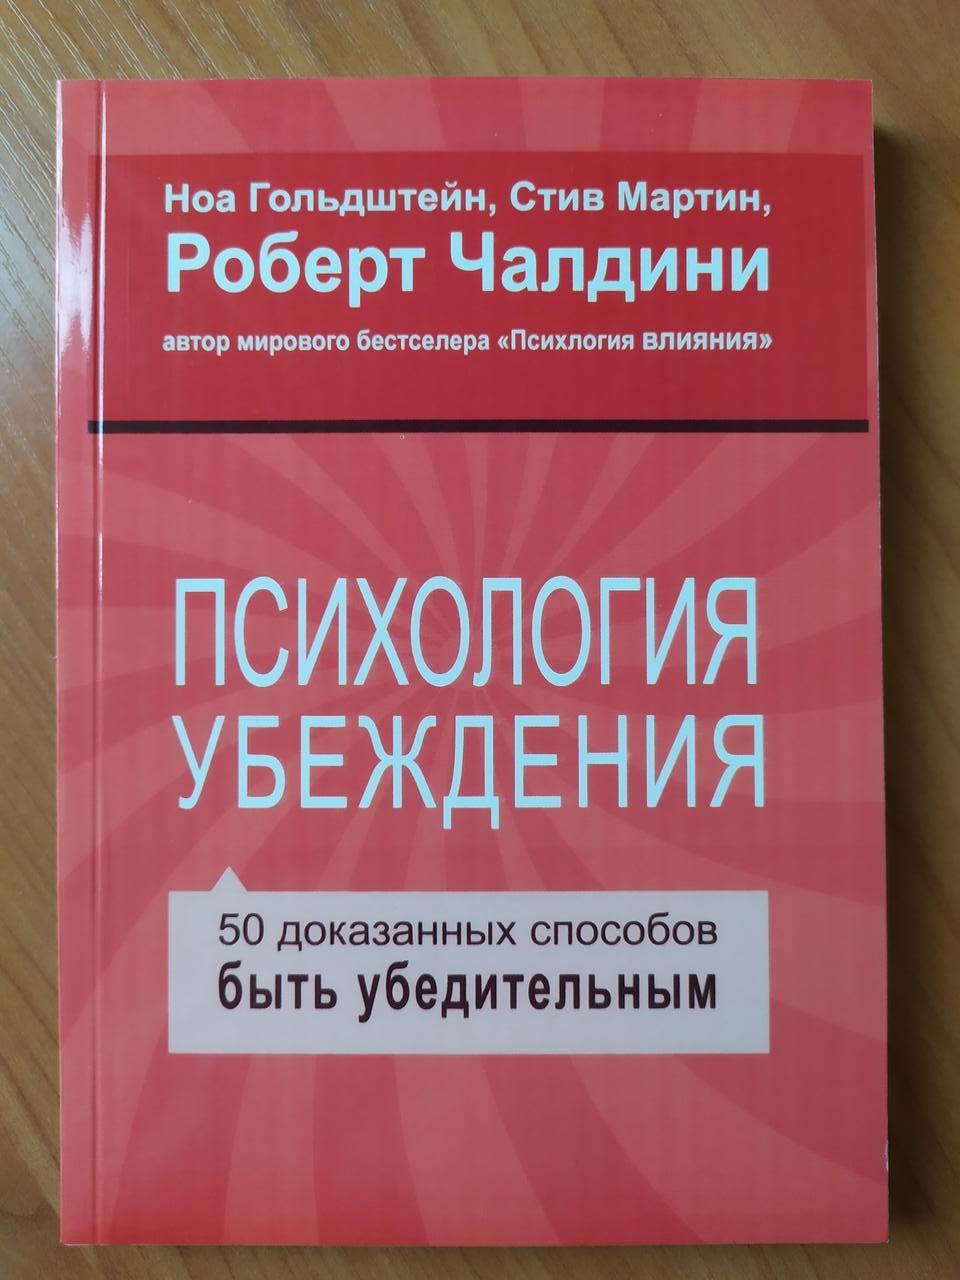 Роберт Чалдини. Психология убеждения